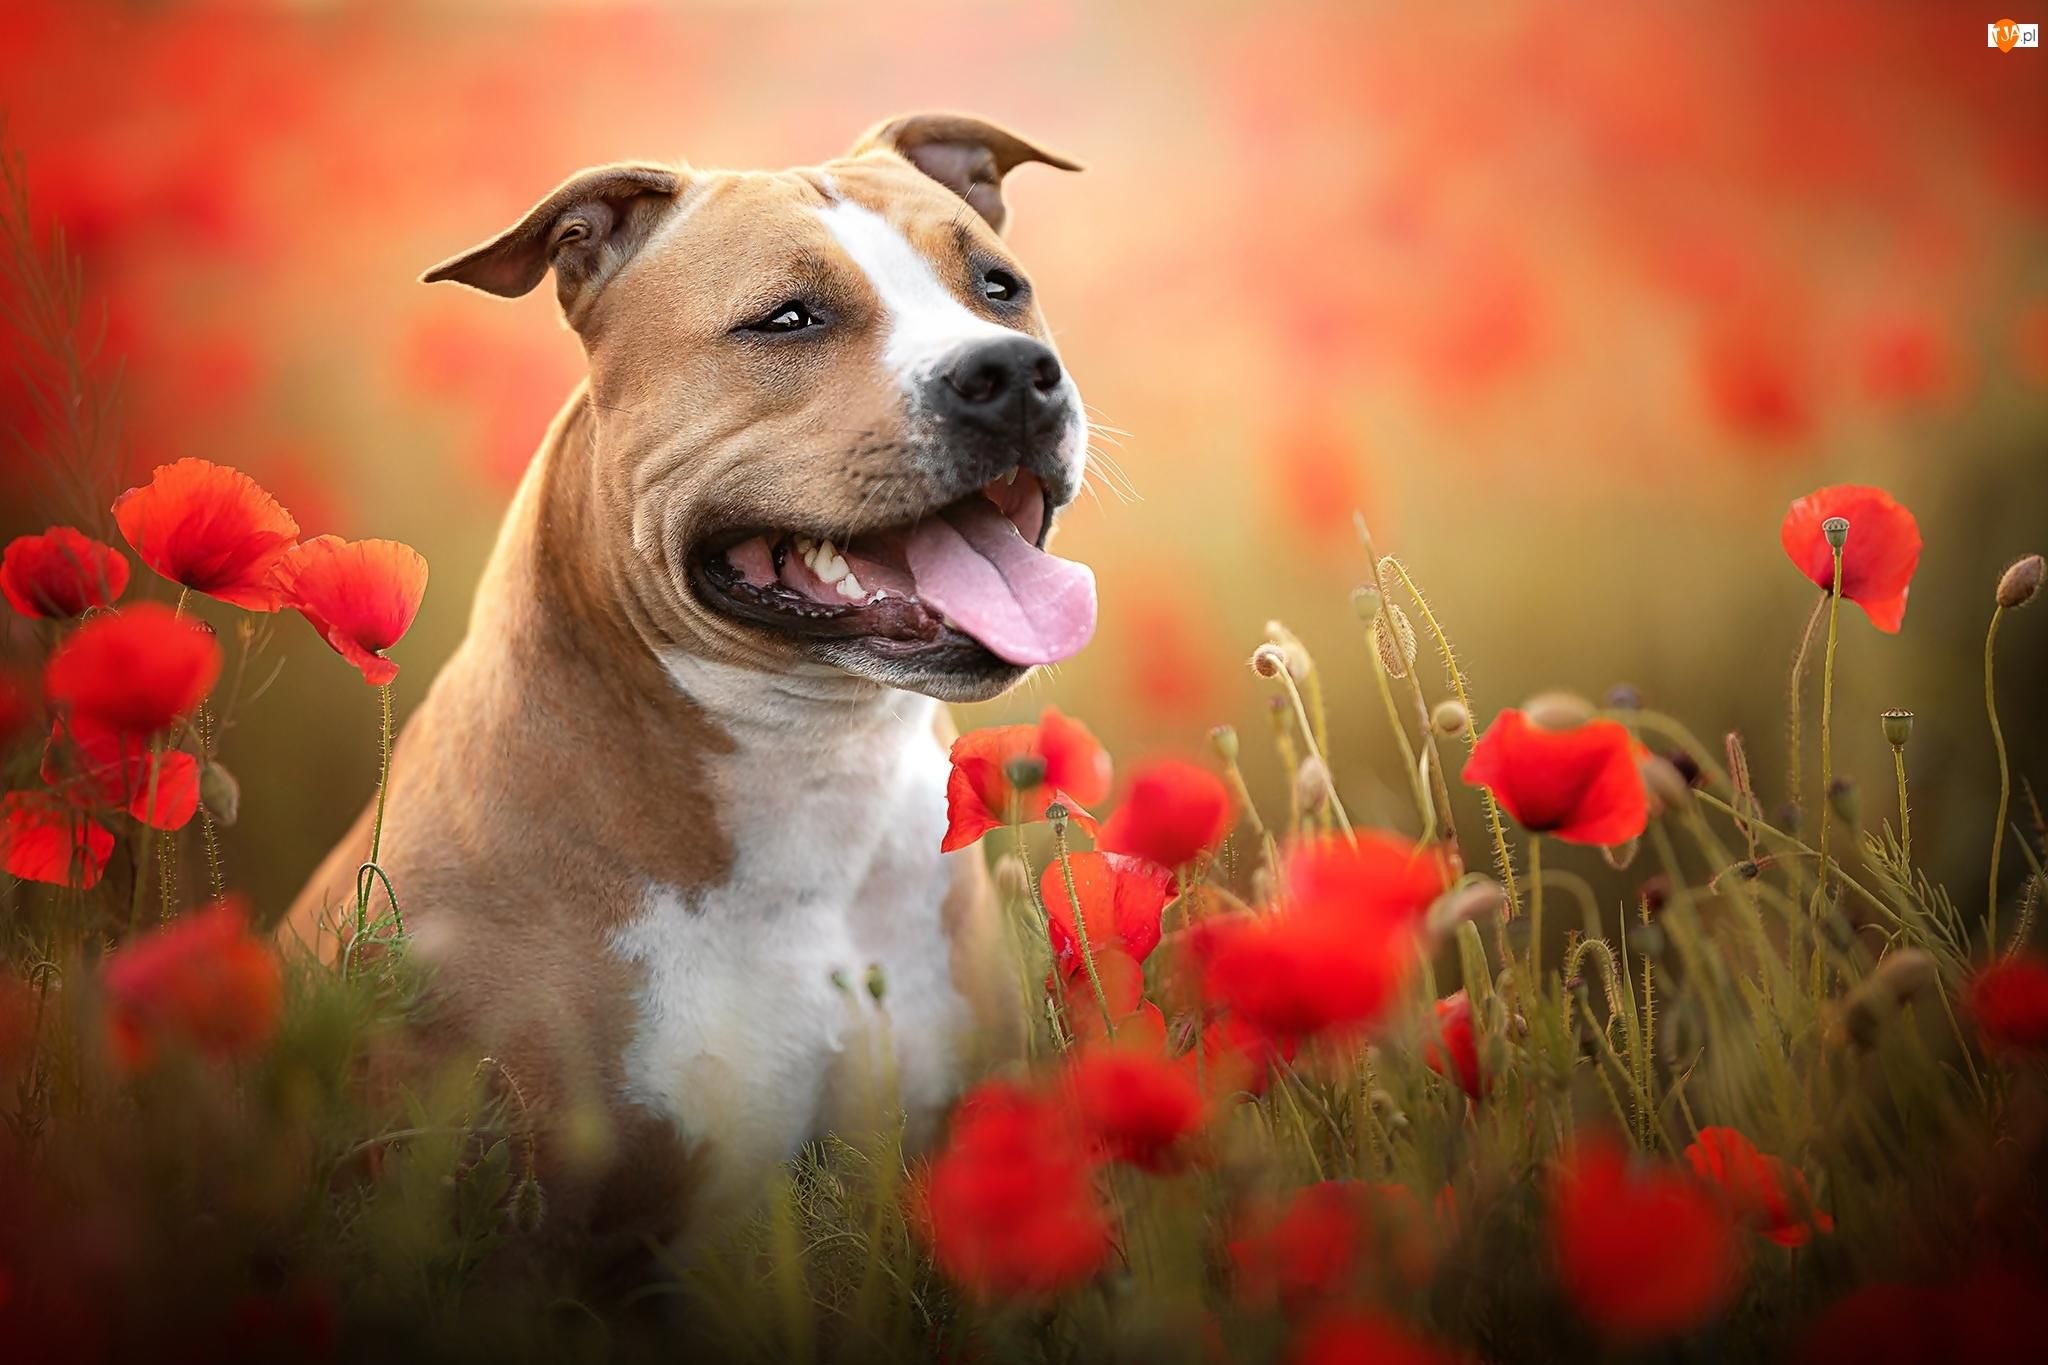 Maki, Pies, Staffordshire bull terrier